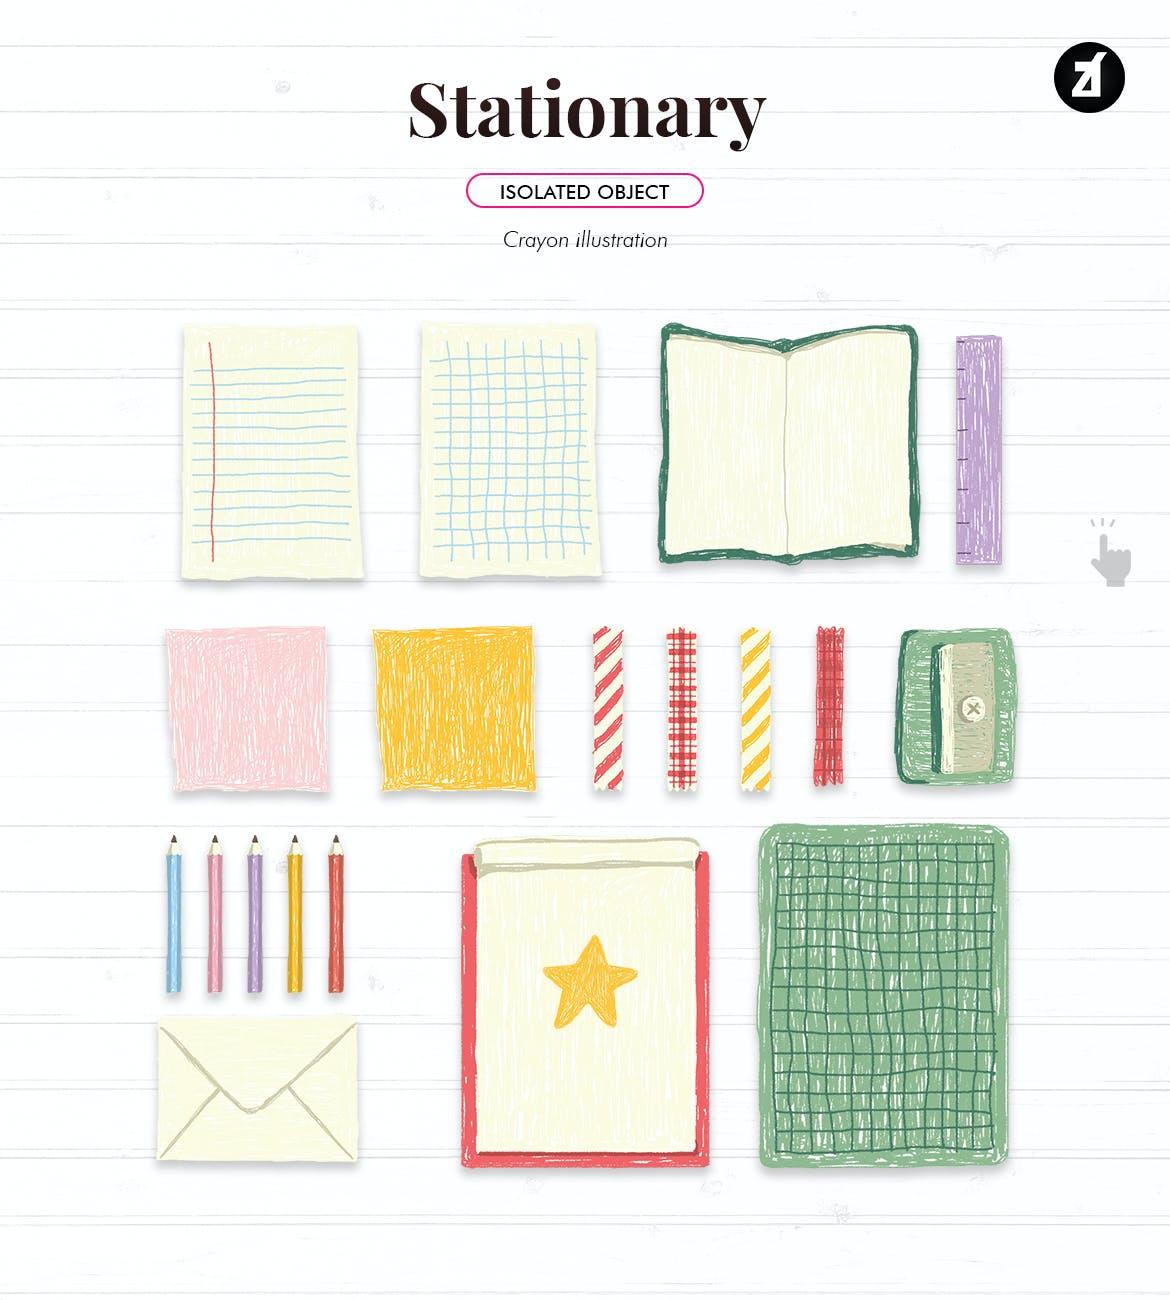 蜡笔绘画效果矢量背景设计素材 Stationary Illustration With Text Layout插图4